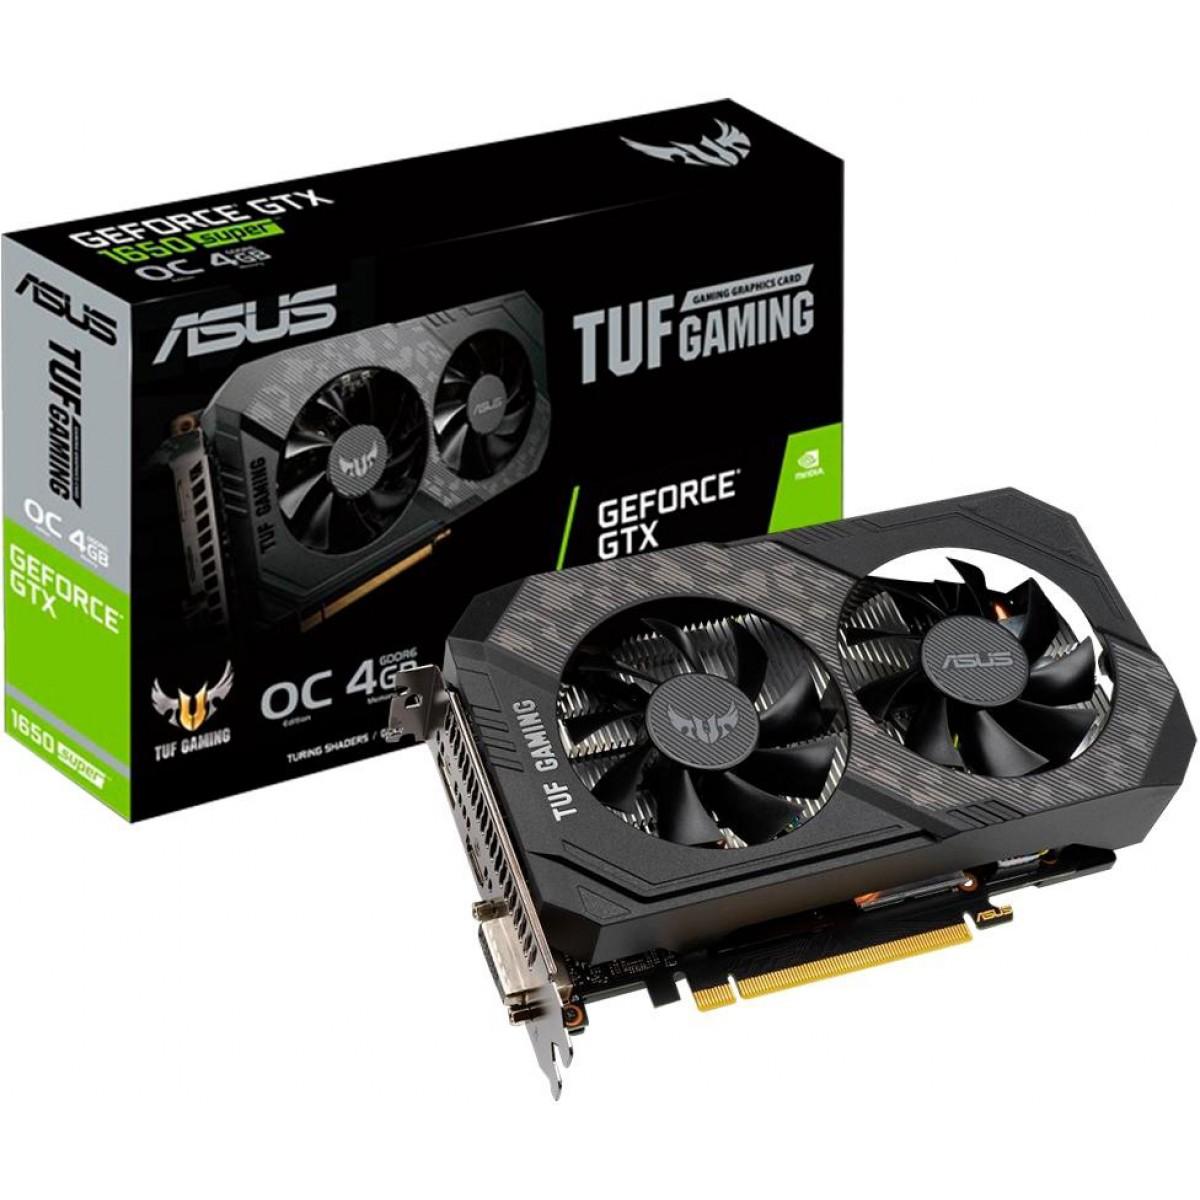 Placa de Vídeo Asus, TUF Gaming GeForce, GTX 1650 Super OC Dual, 4GB, GDDR6, 128Bit, TUF-GTX1650S-O4G-GAMING